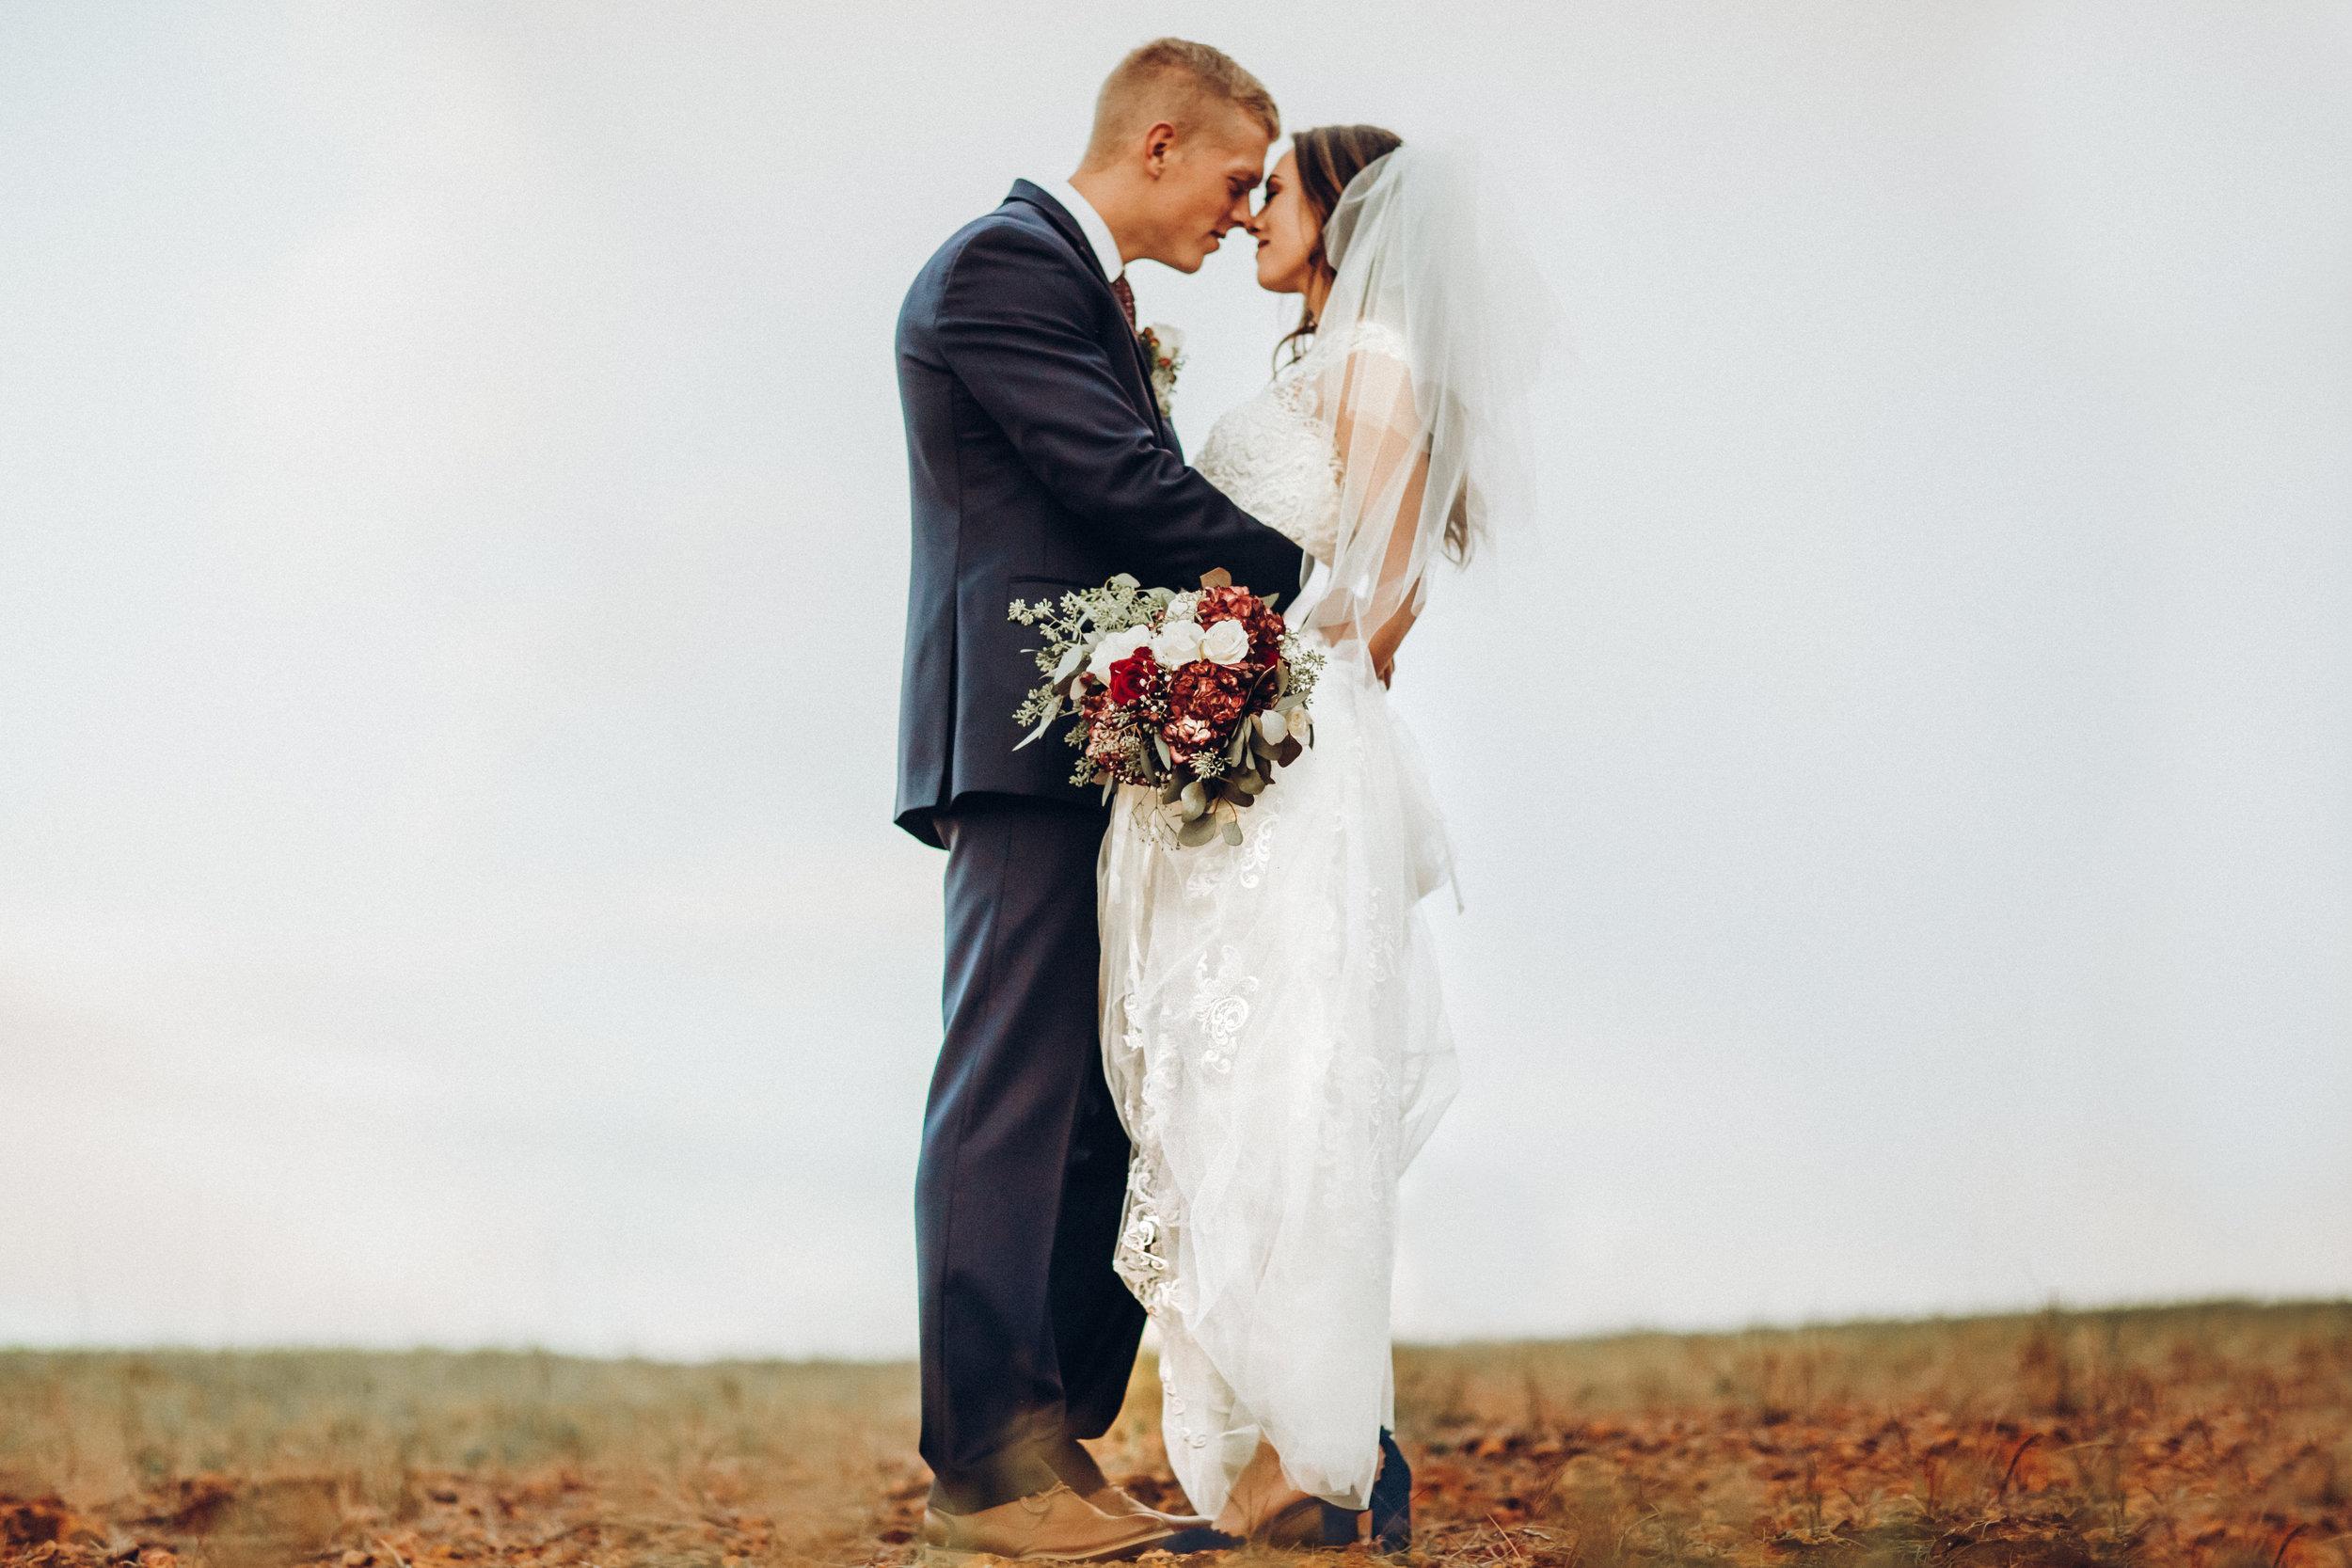 7. Bride + Groom -  Romantic Backyard Farm Wedding - Lauren+Daniel 014.jpg